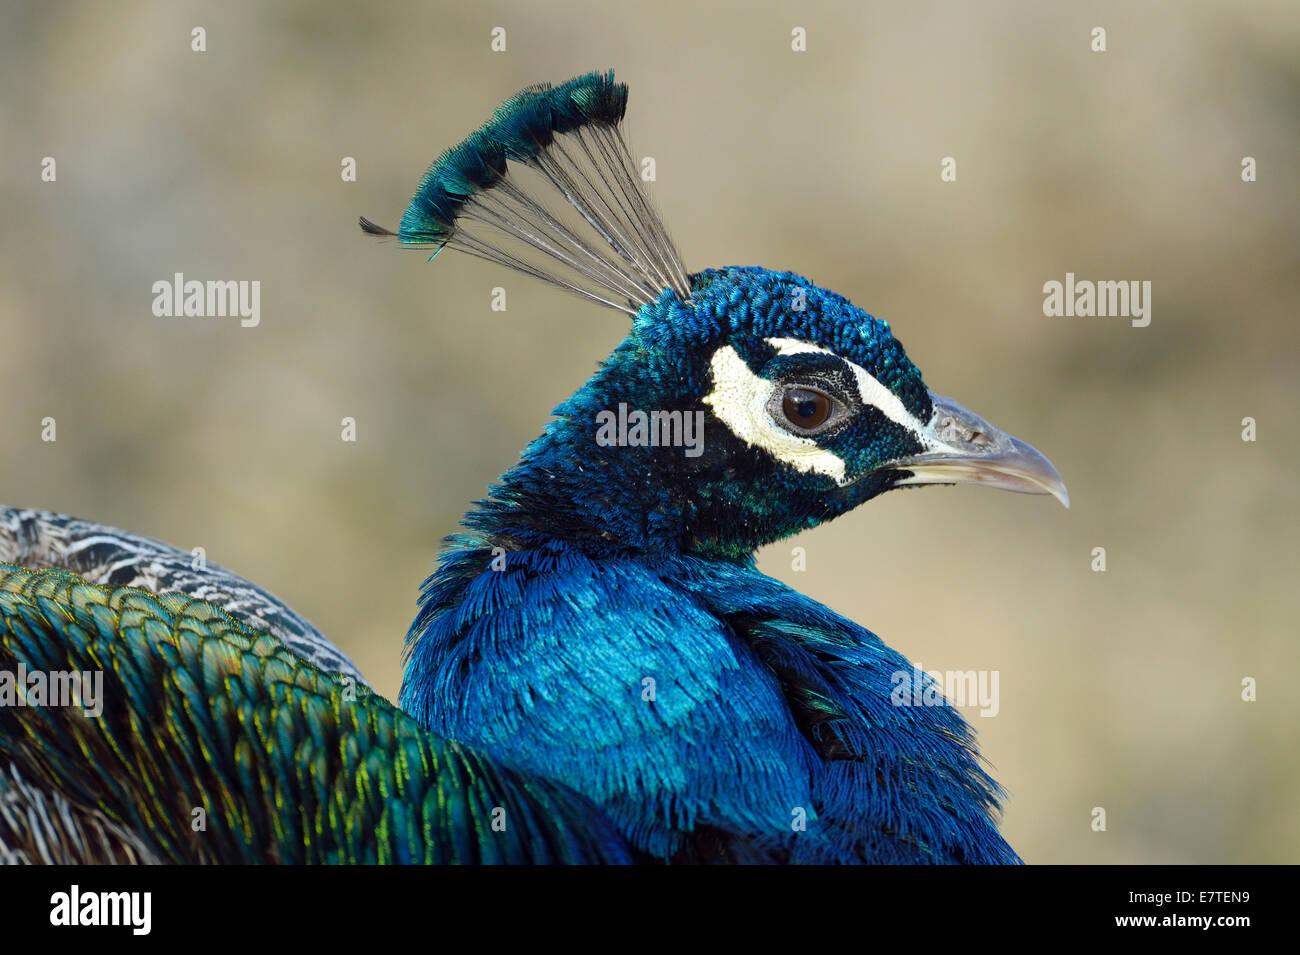 Indian Peafowl or Blue Peafowl (Pavo cristatus), male, Zoo, Zurich, Switzerland - Stock Image